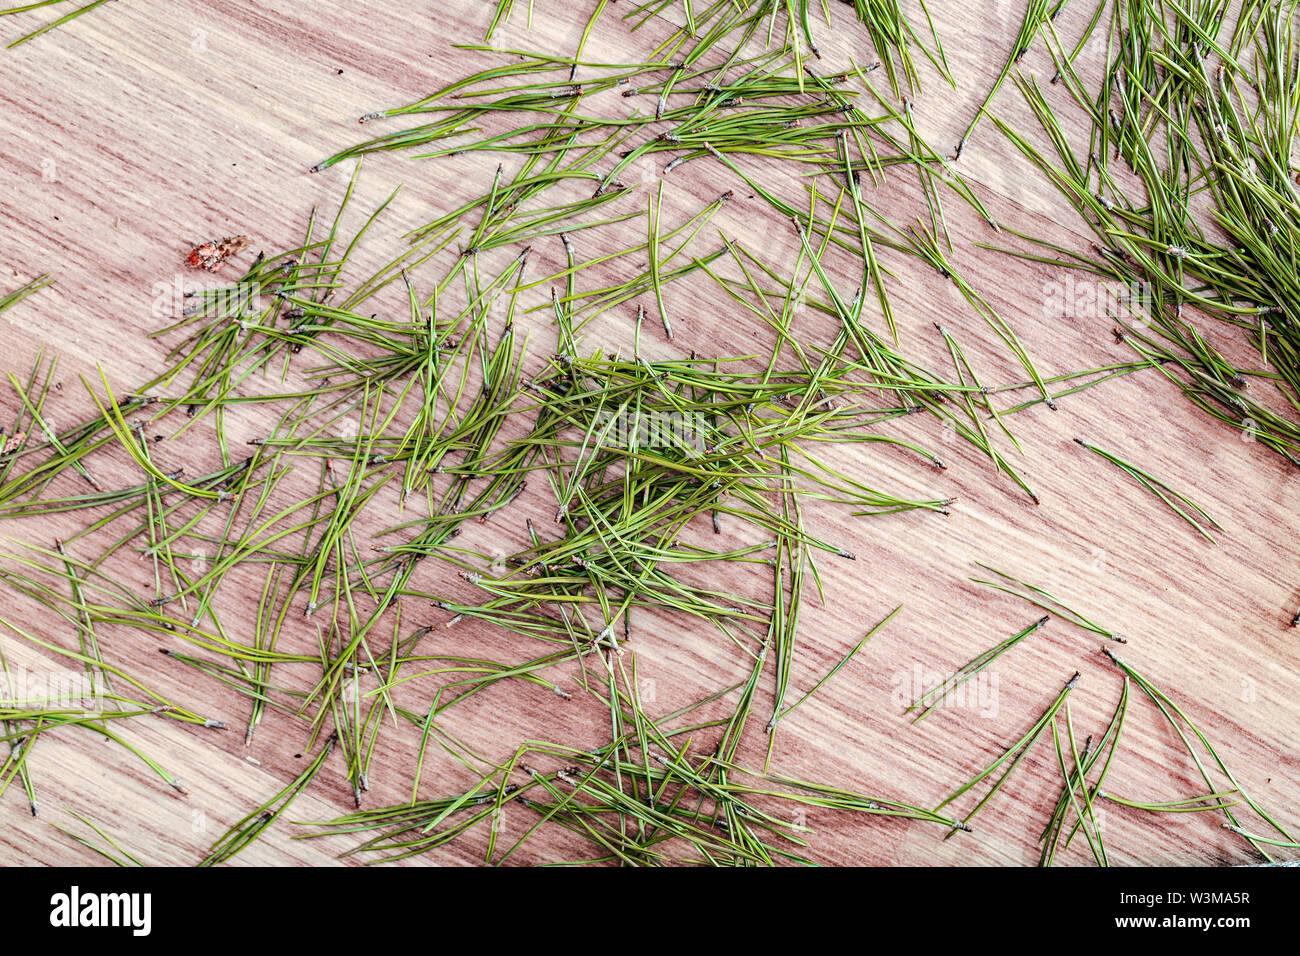 Fallen spruce needles on the floor in the room. - Stock Image